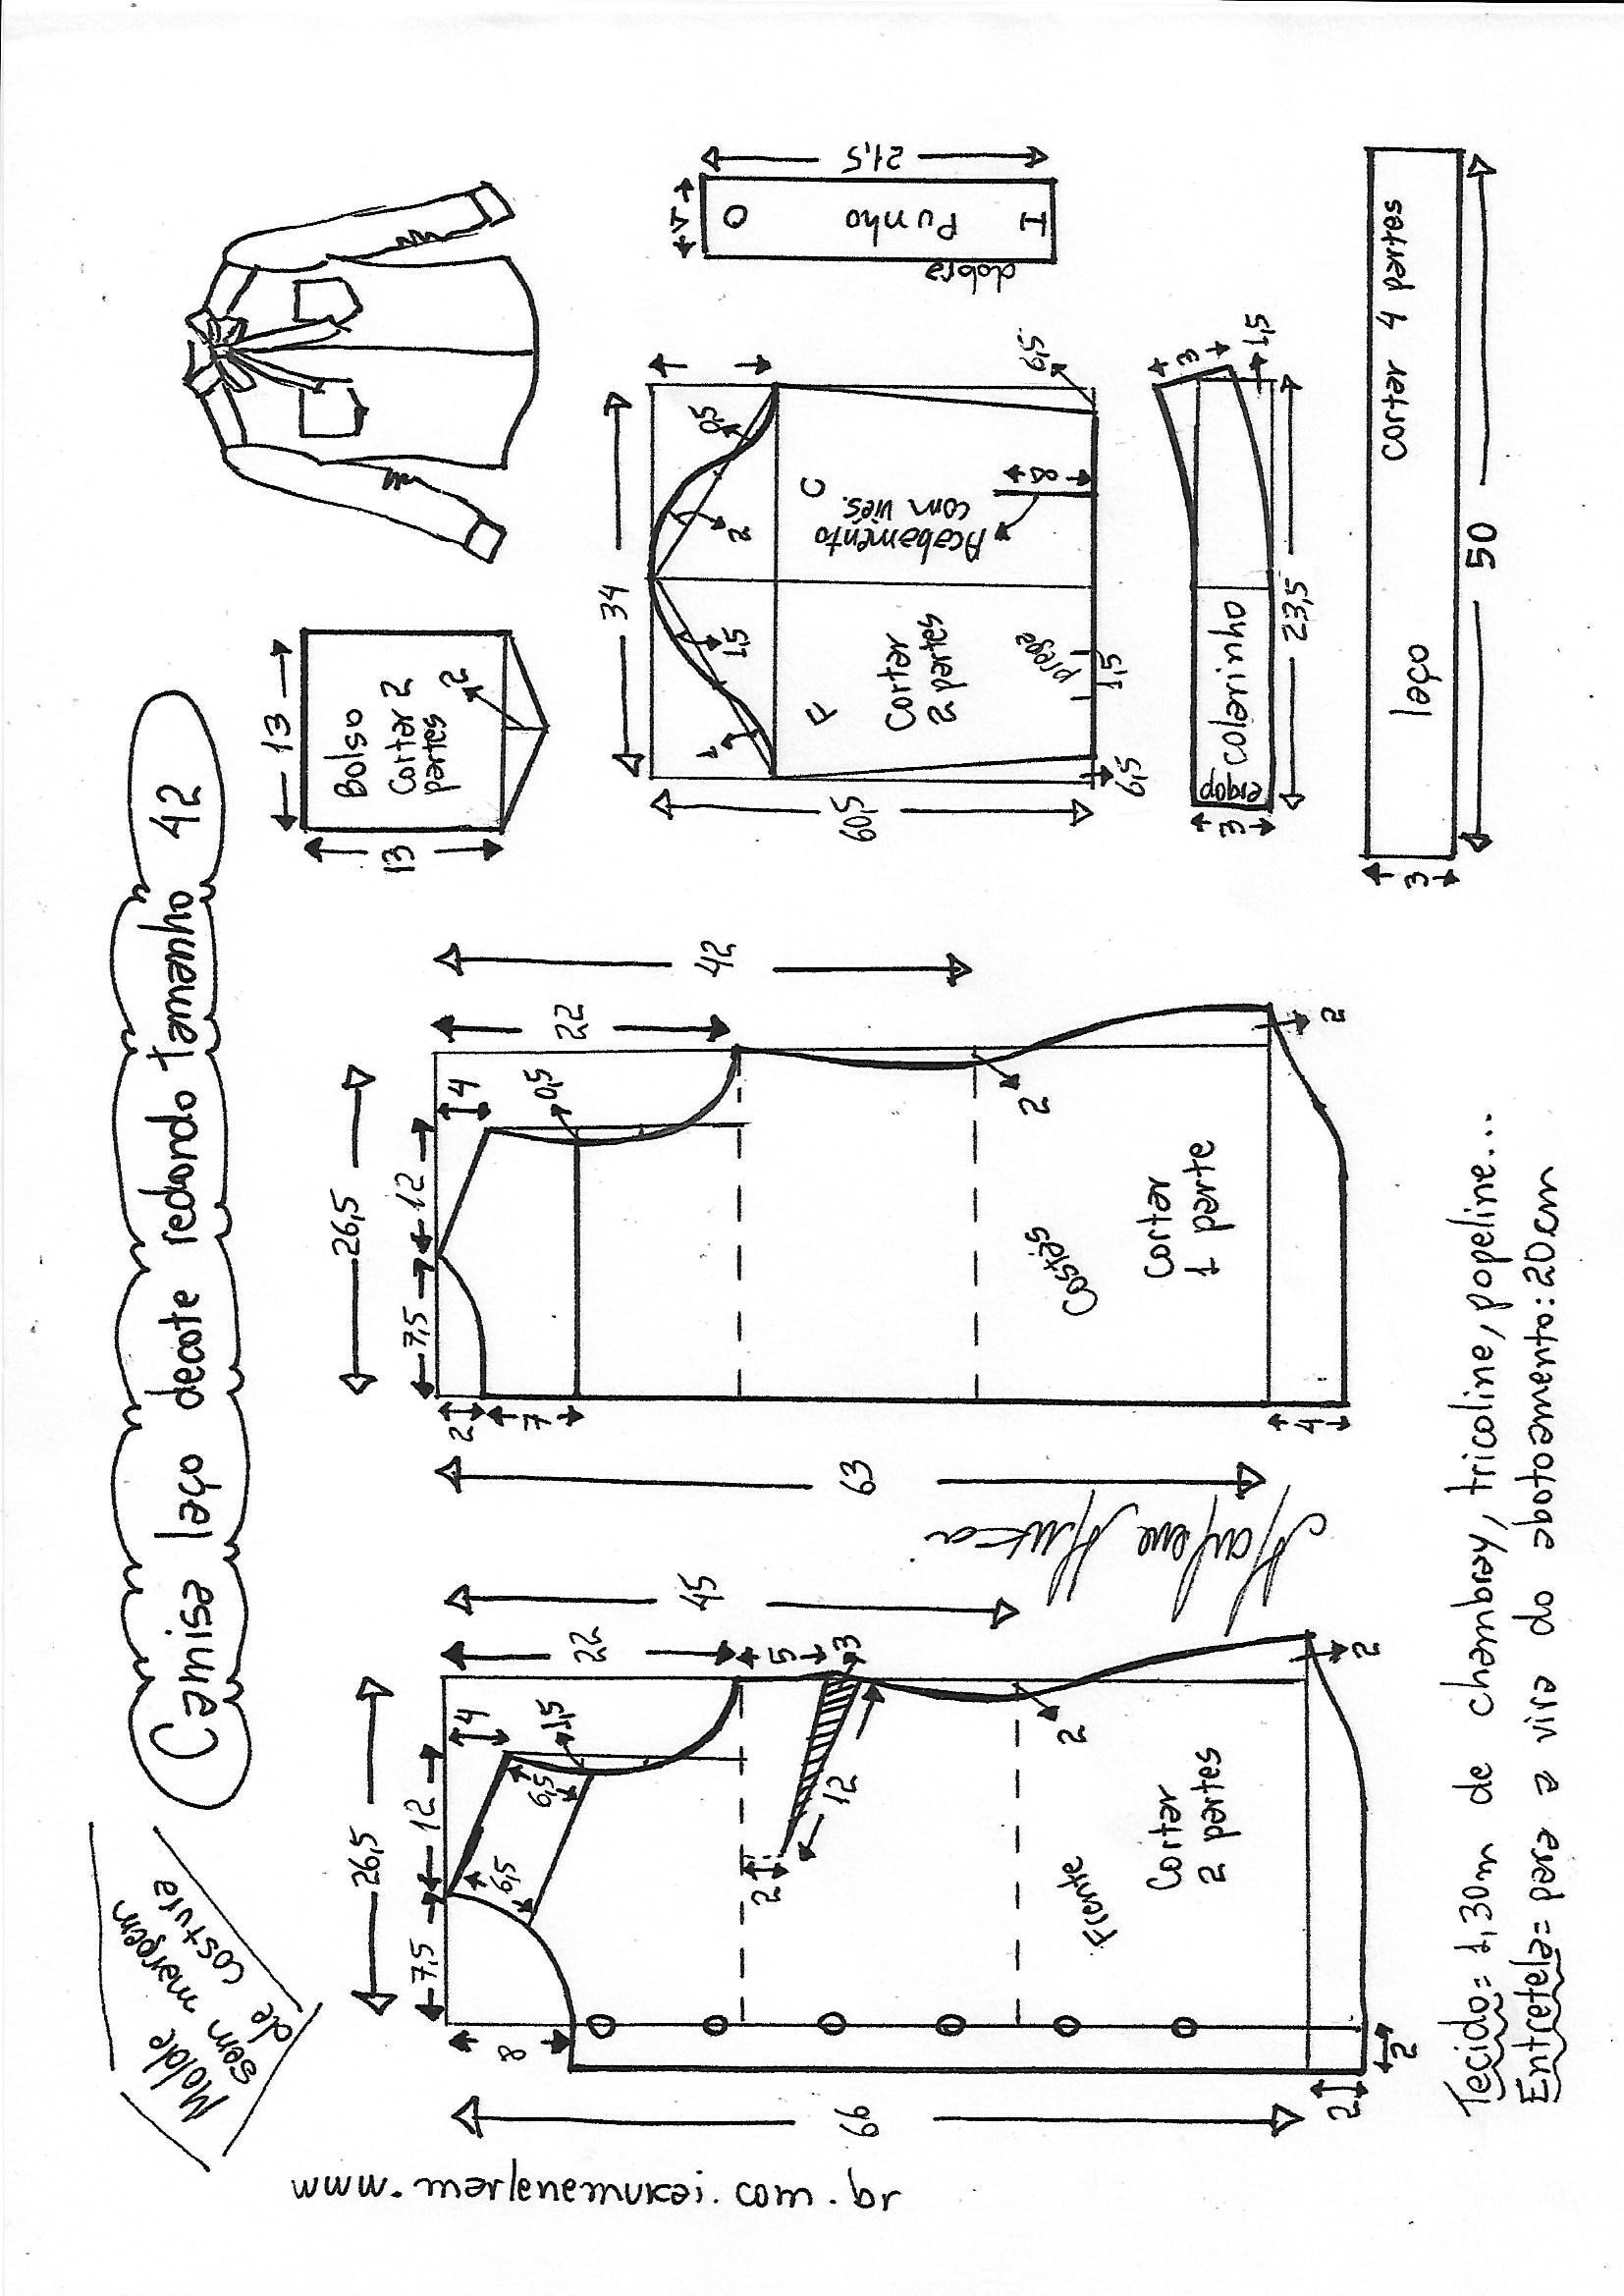 car part diagram 2003 cadillac cts serpentine belt diagram